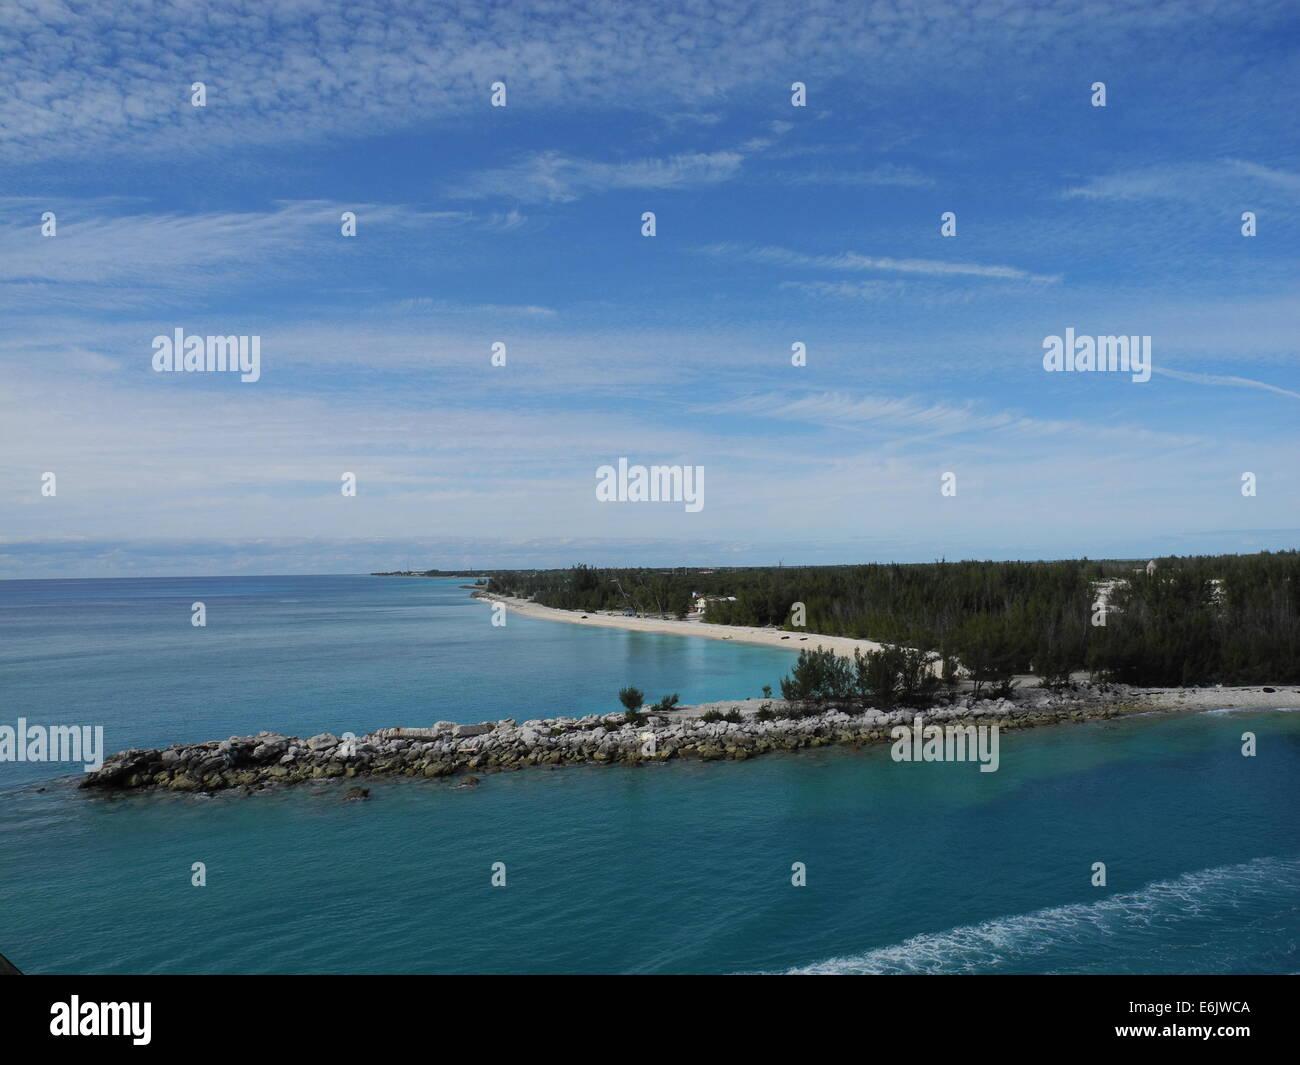 Sandbar leaving the Bahamas - Stock Image